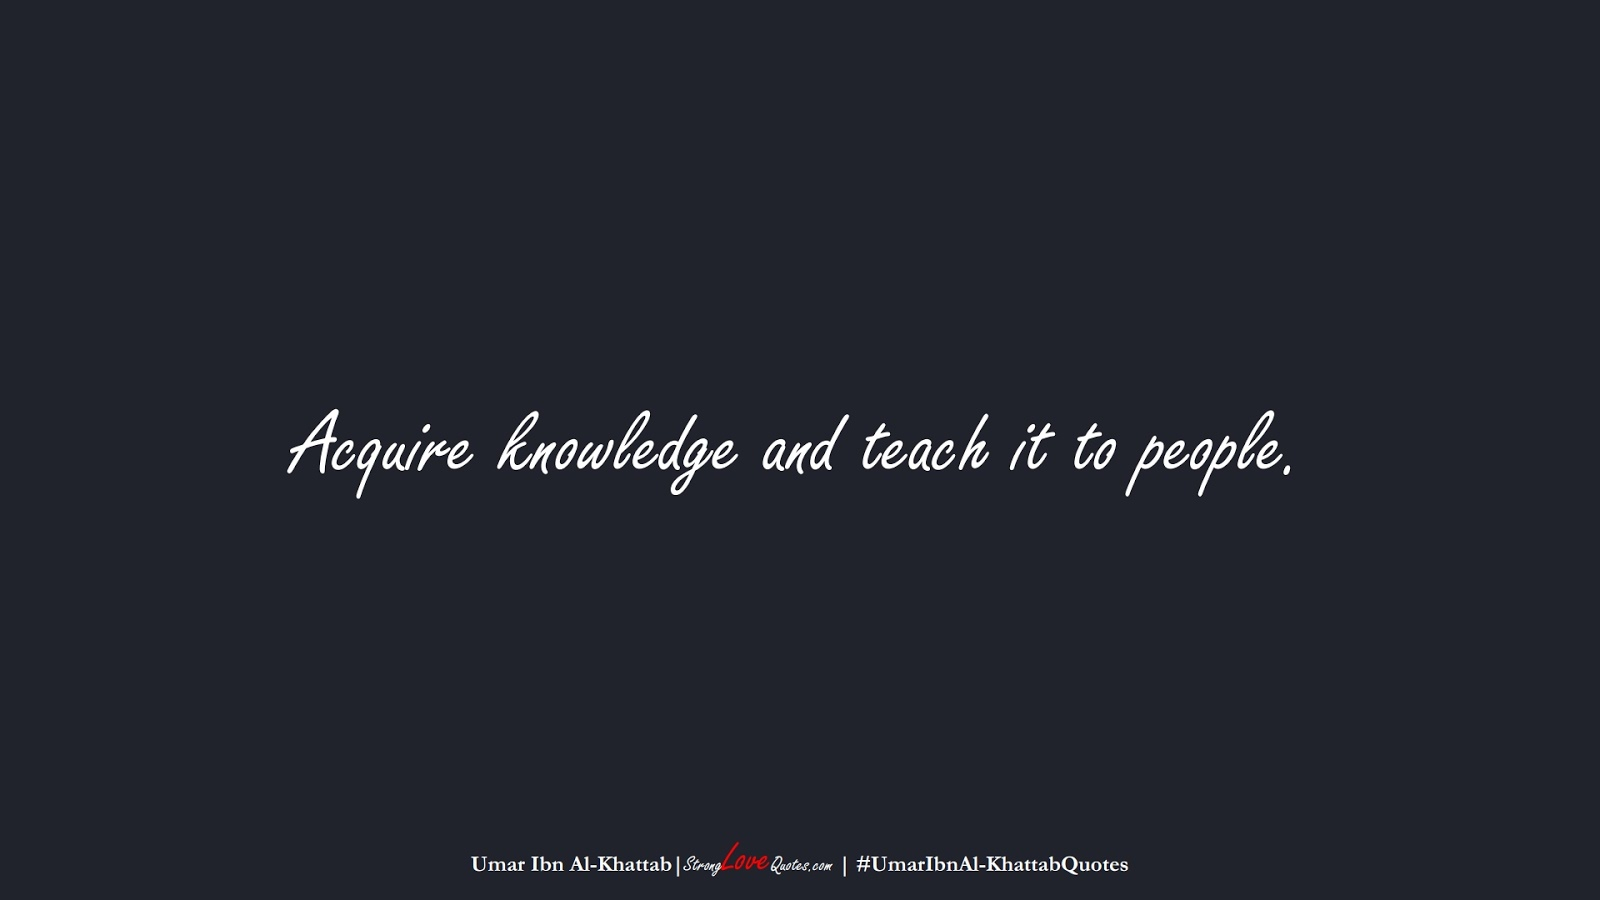 Acquire knowledge and teach it to people. (Umar Ibn Al-Khattab);  #UmarIbnAl-KhattabQuotes